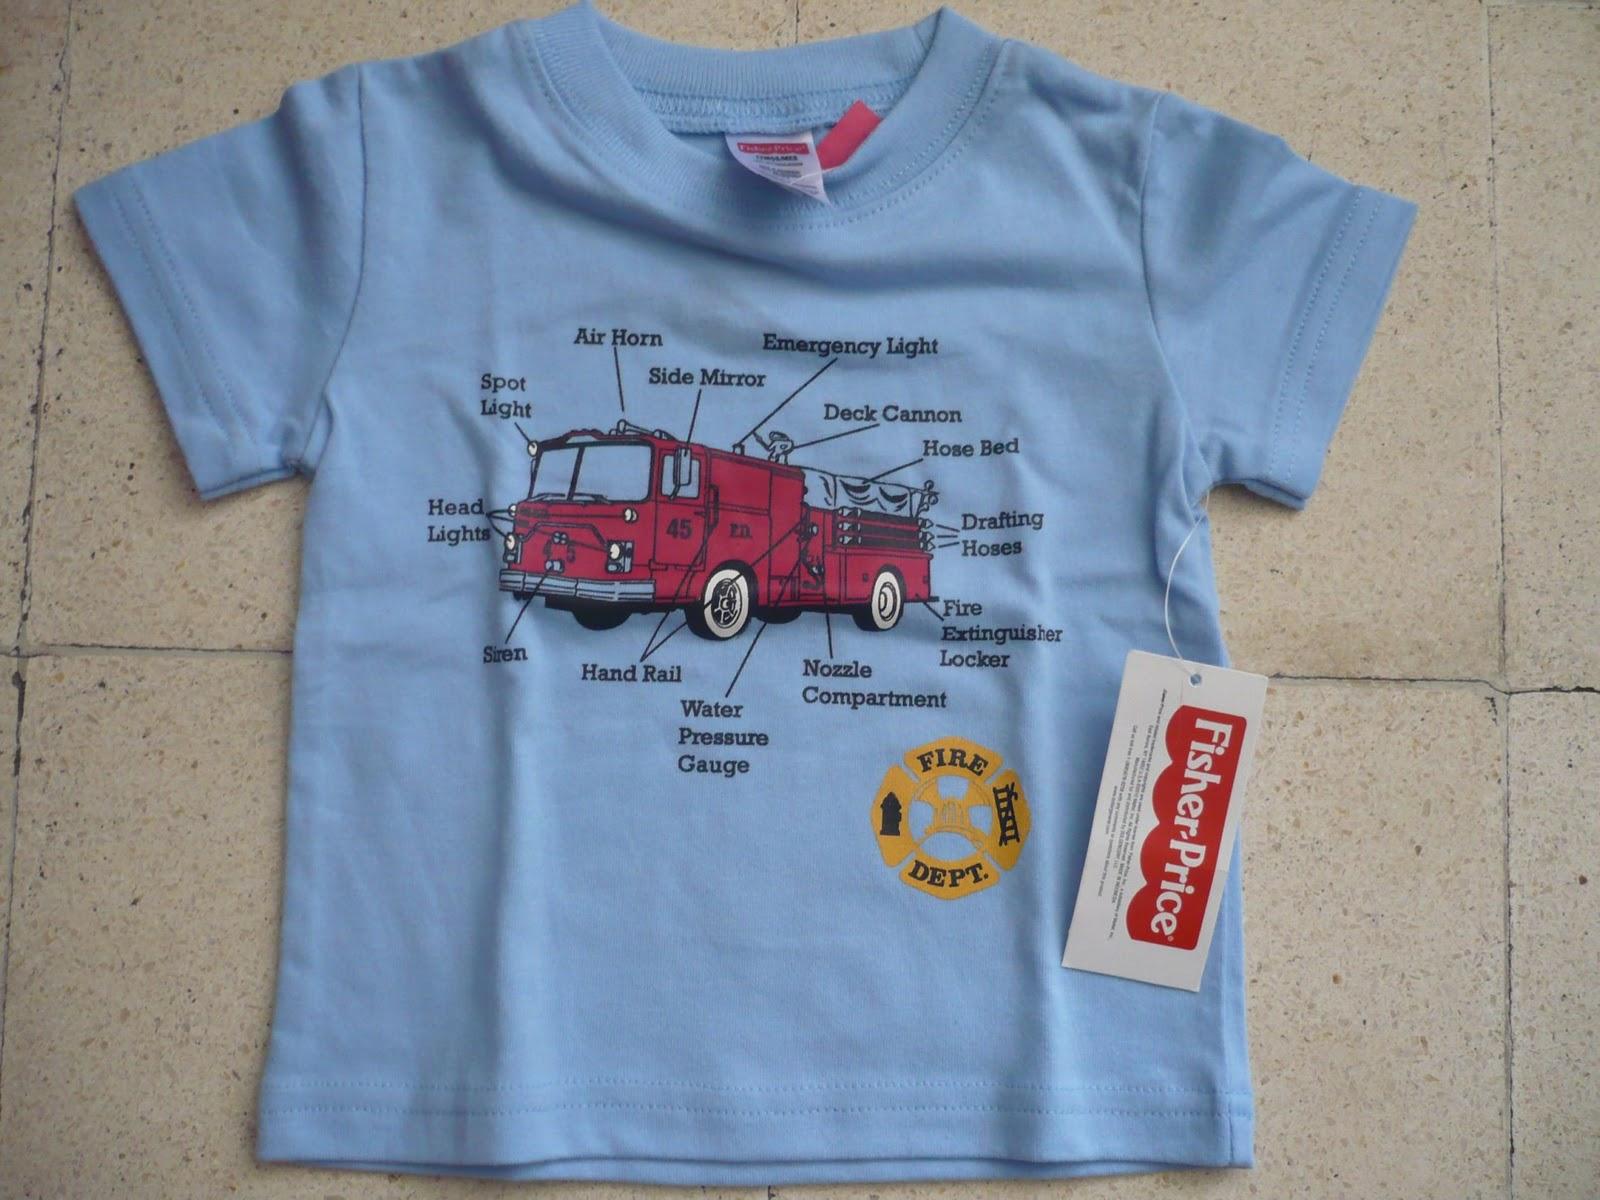 Koleksi Baju Kaos Anak Branded Asli